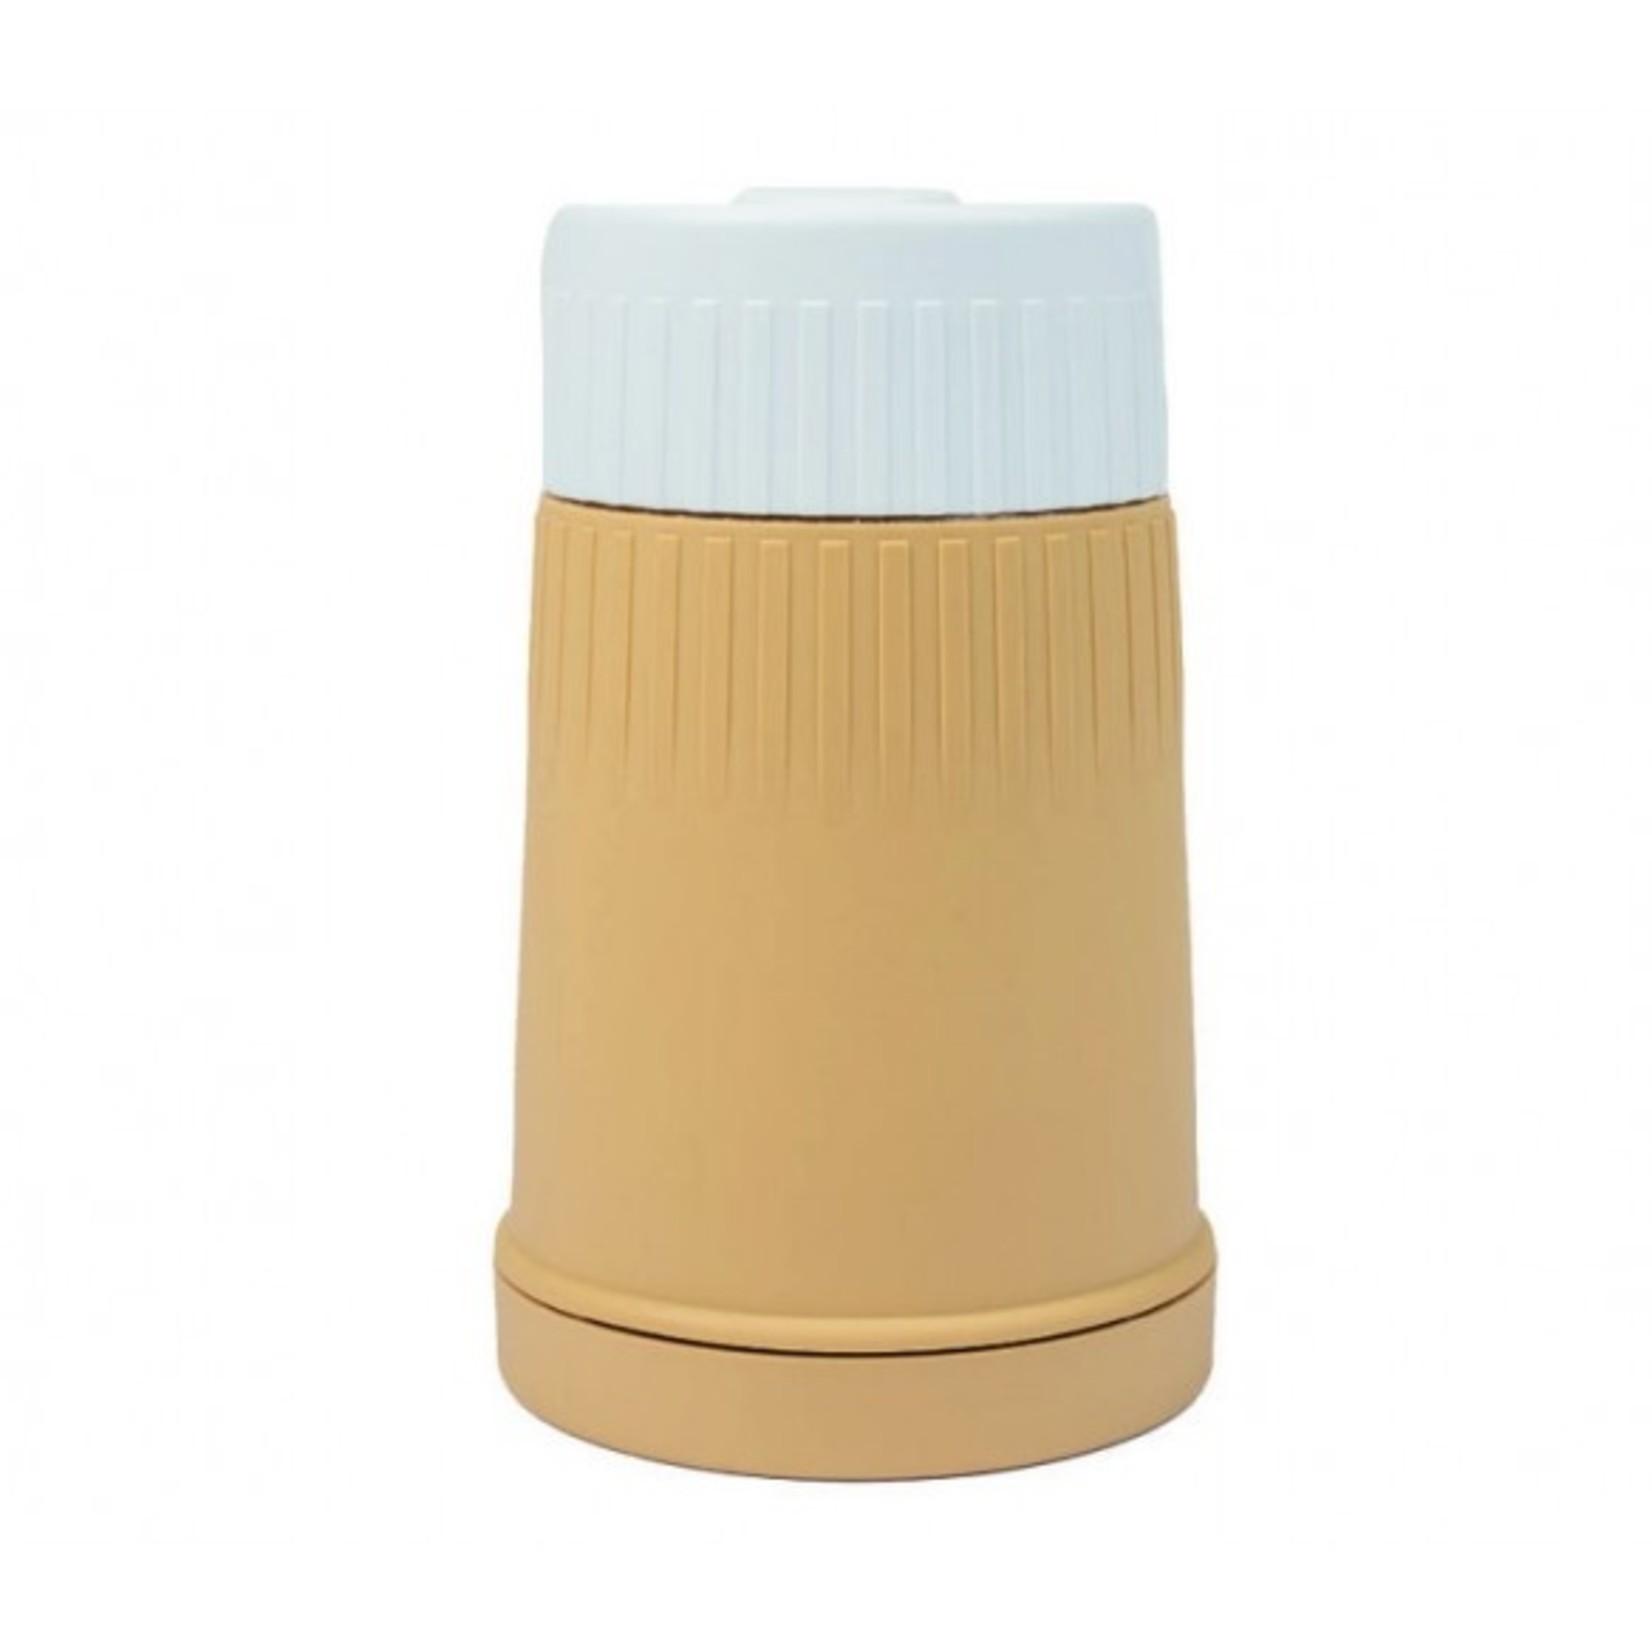 Philley Philley Melkpoederverdeler Limited edition Ocher yellow 3.0